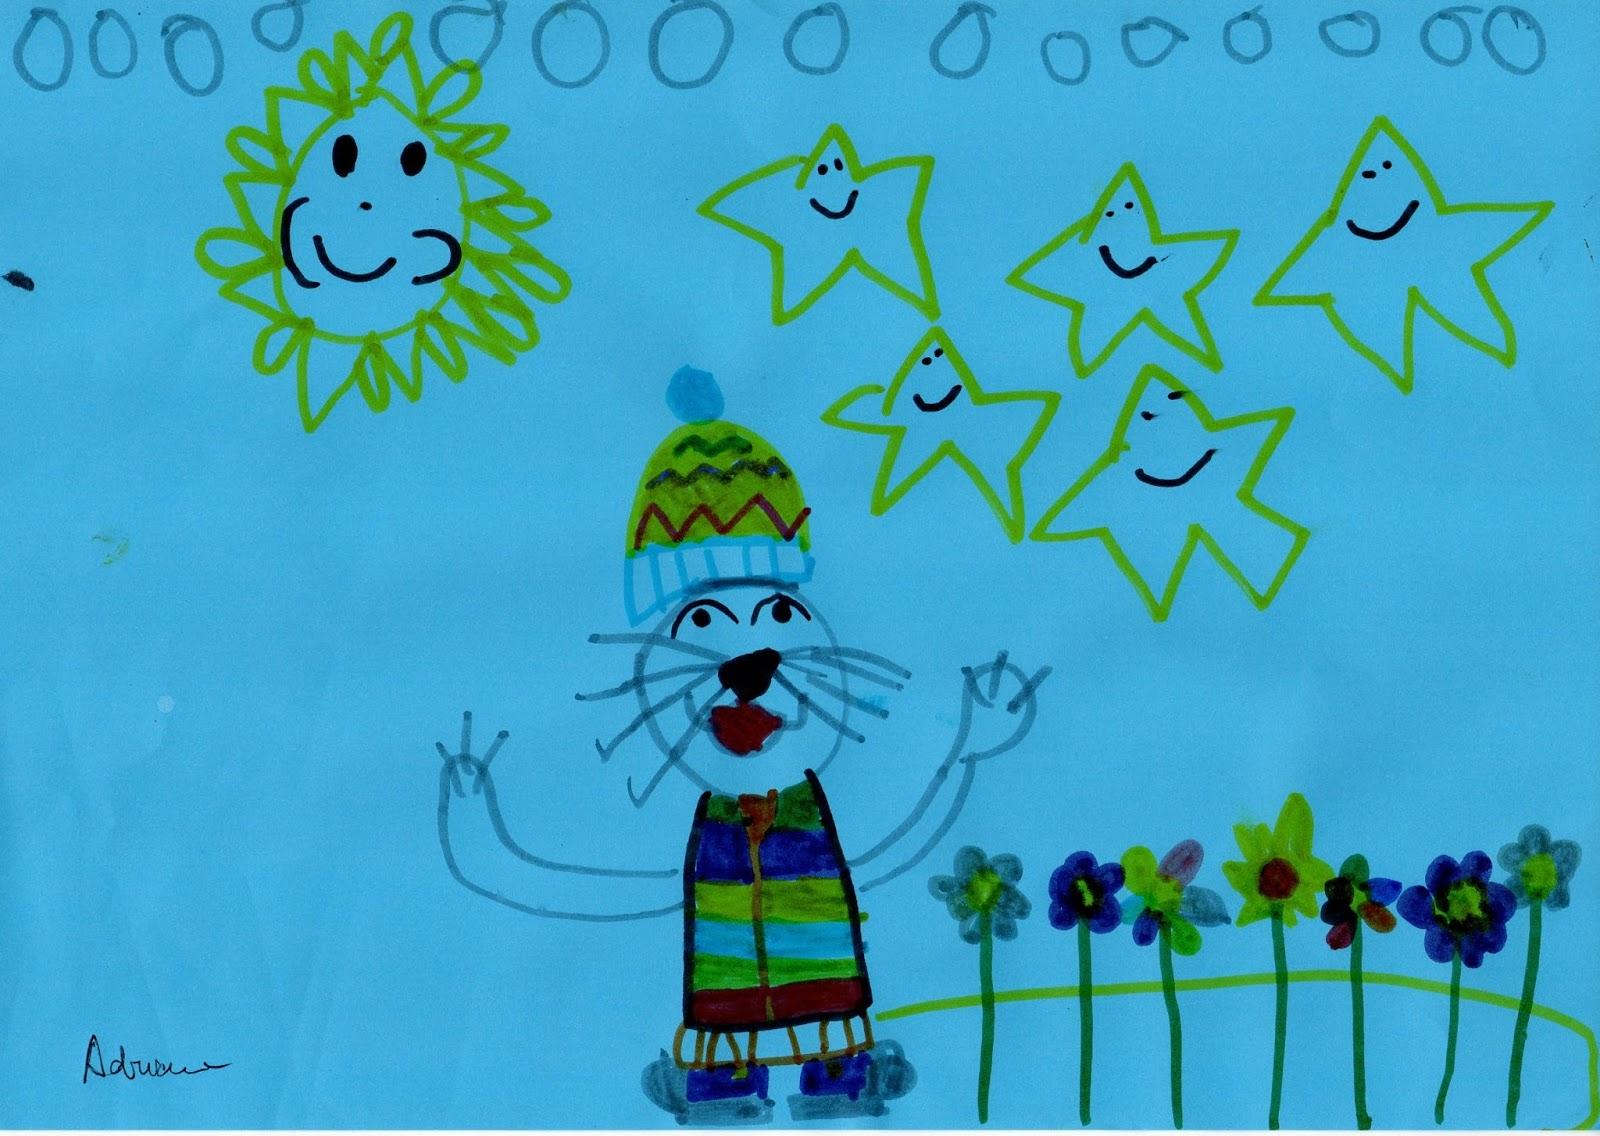 Profe Rafa De Infantil Dibujos Cuento La Flor Estrella